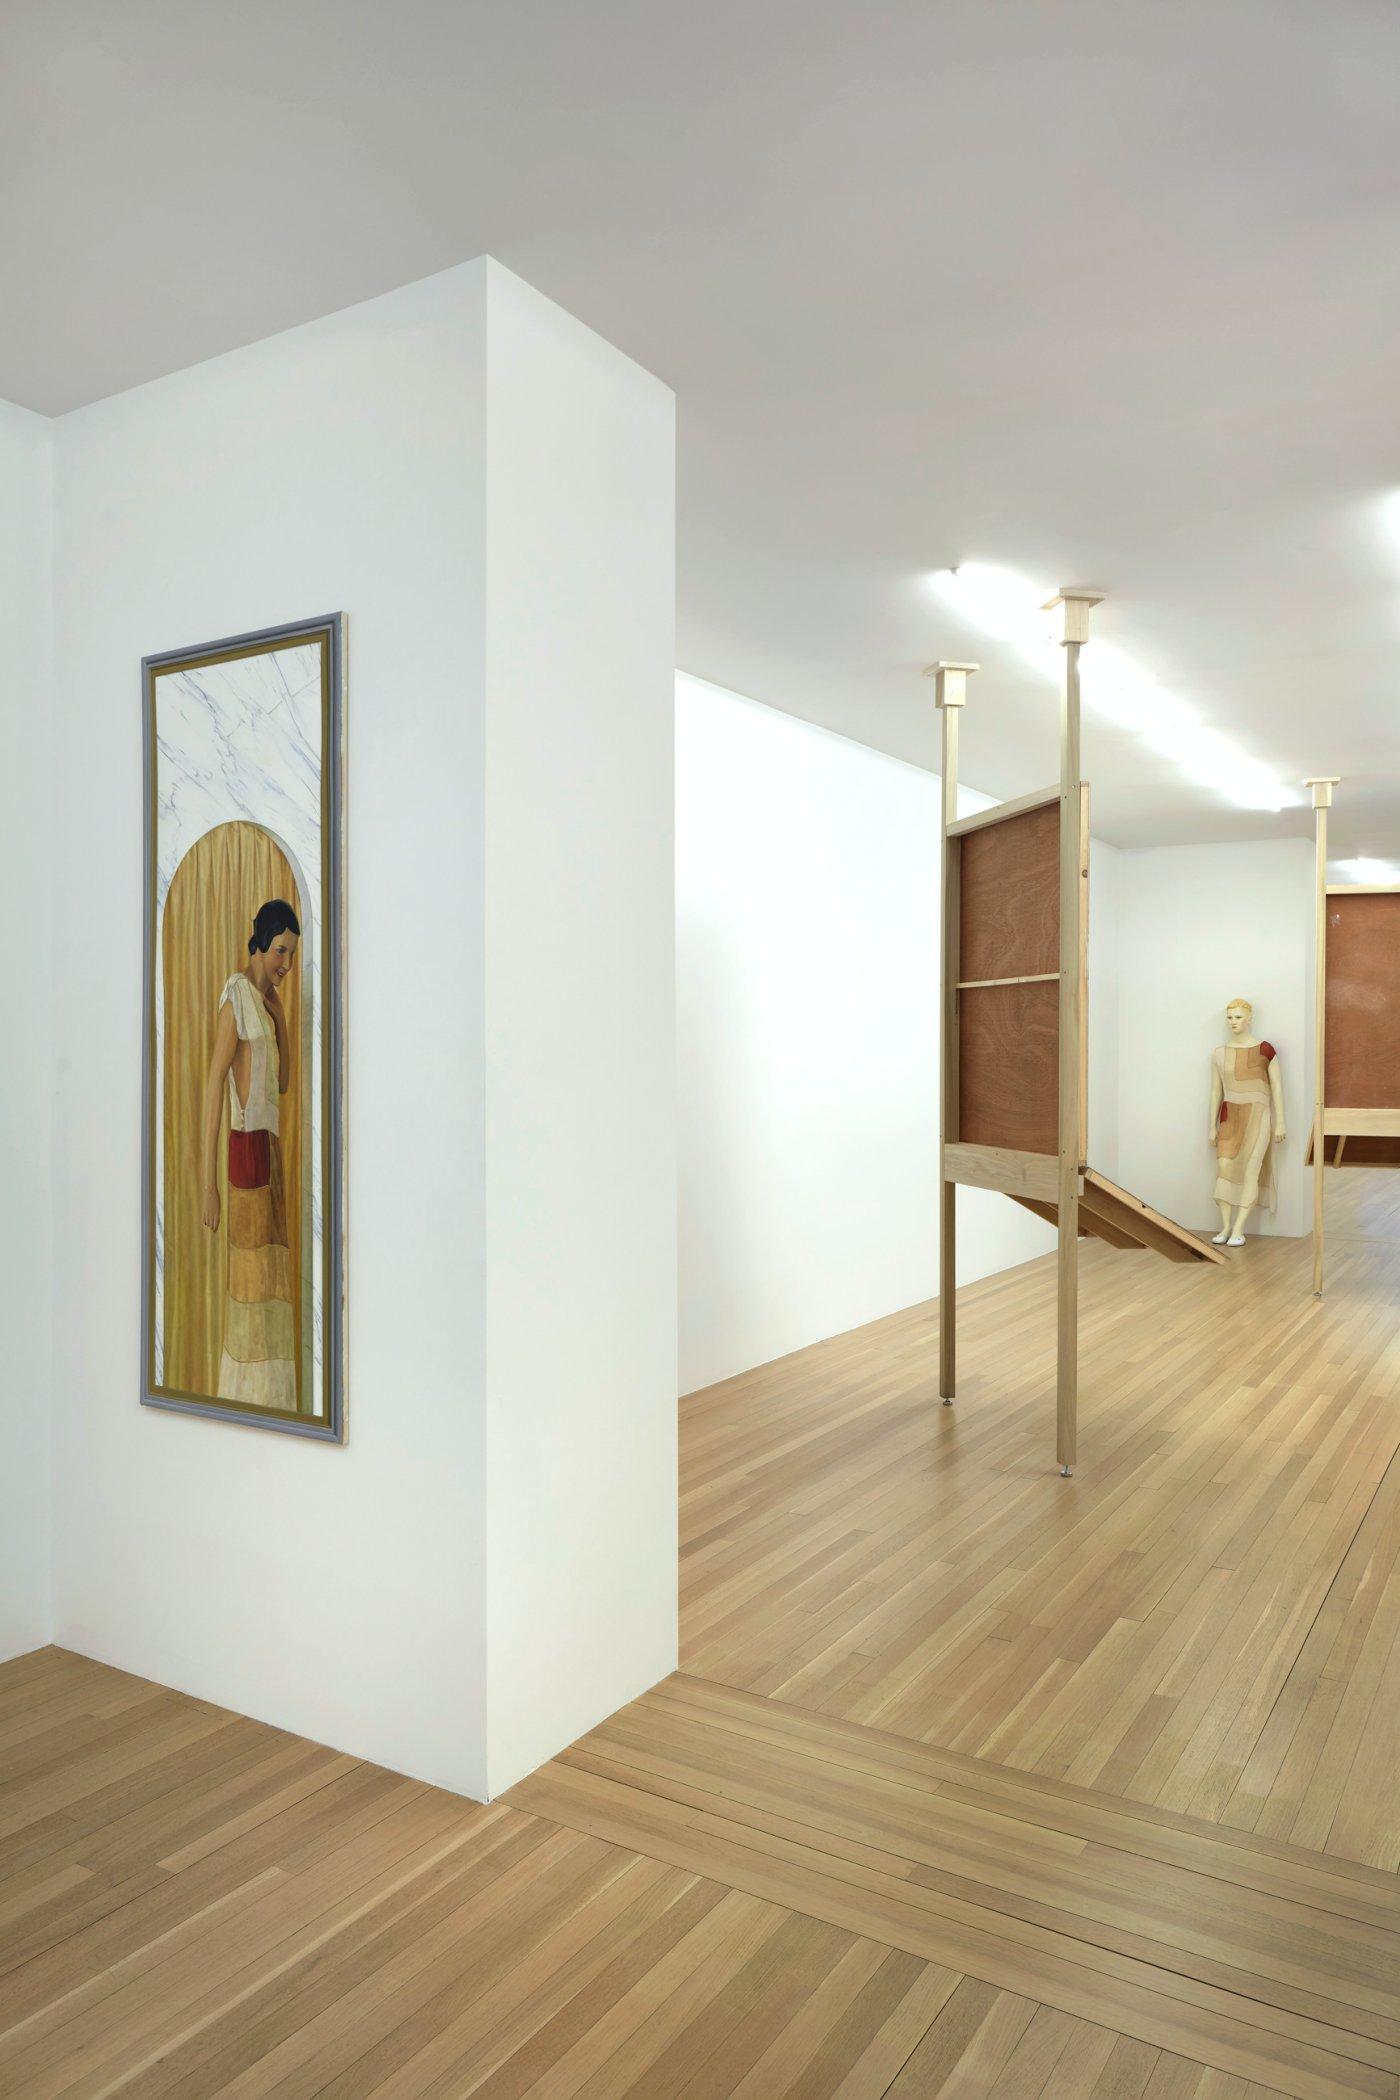 Galerie Buchholz New York Lucy McKenzie 2